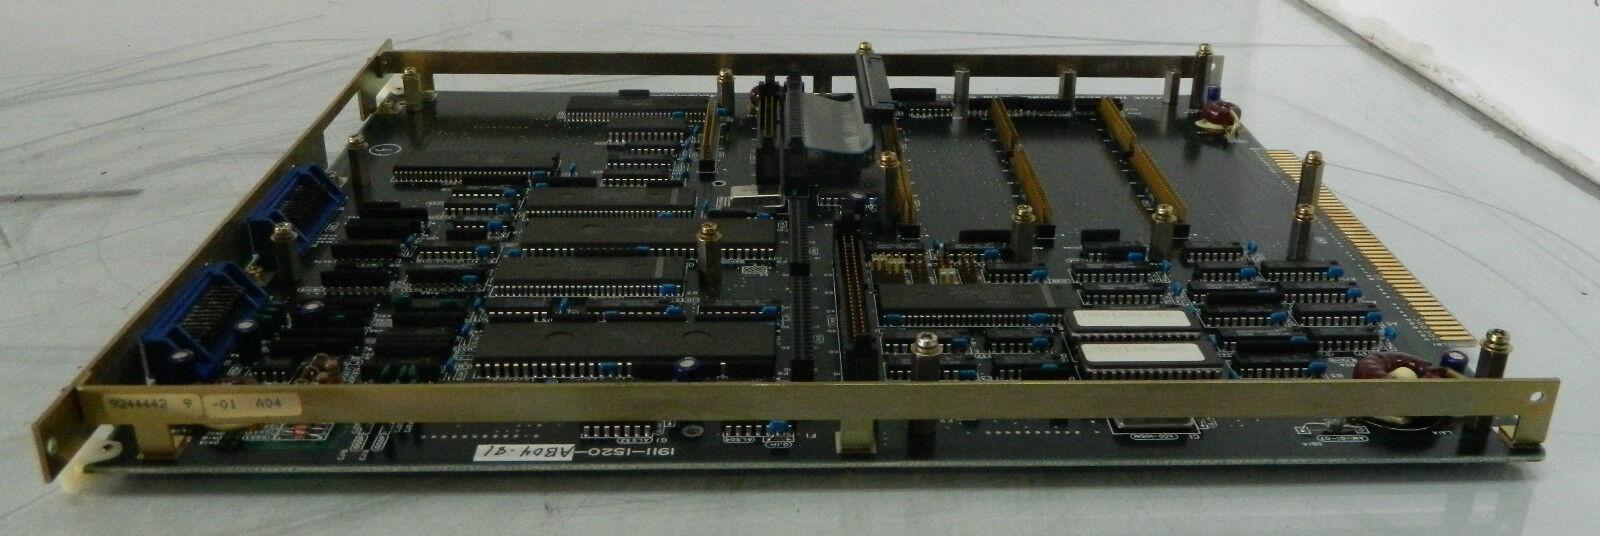 Okuma OPUS 5000-II Main Board, E4809-045-091-C, Used, Warranty